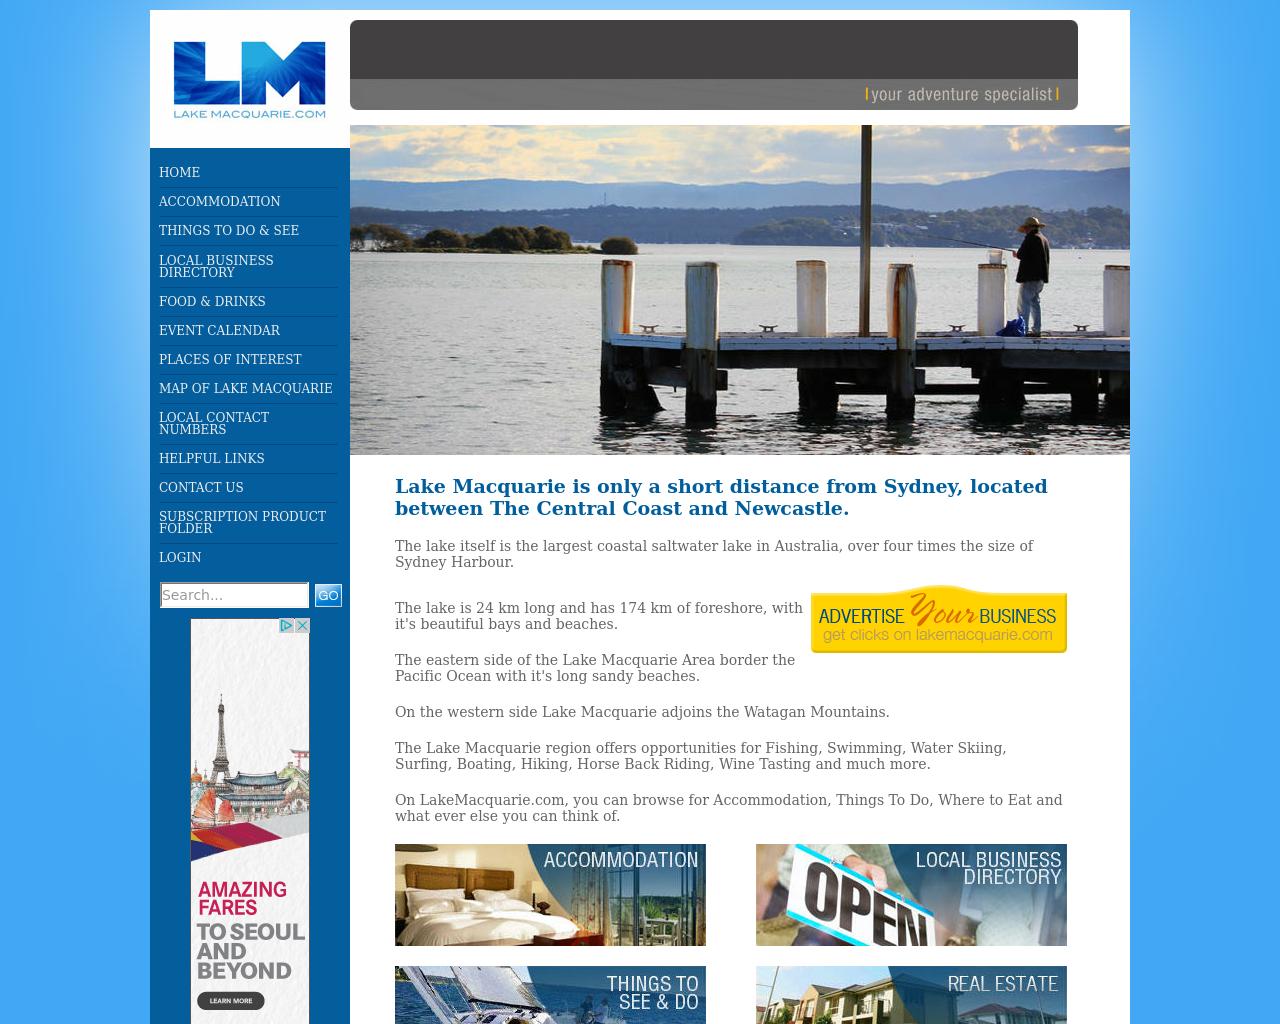 LakeMacquarie.com-Advertising-Reviews-Pricing